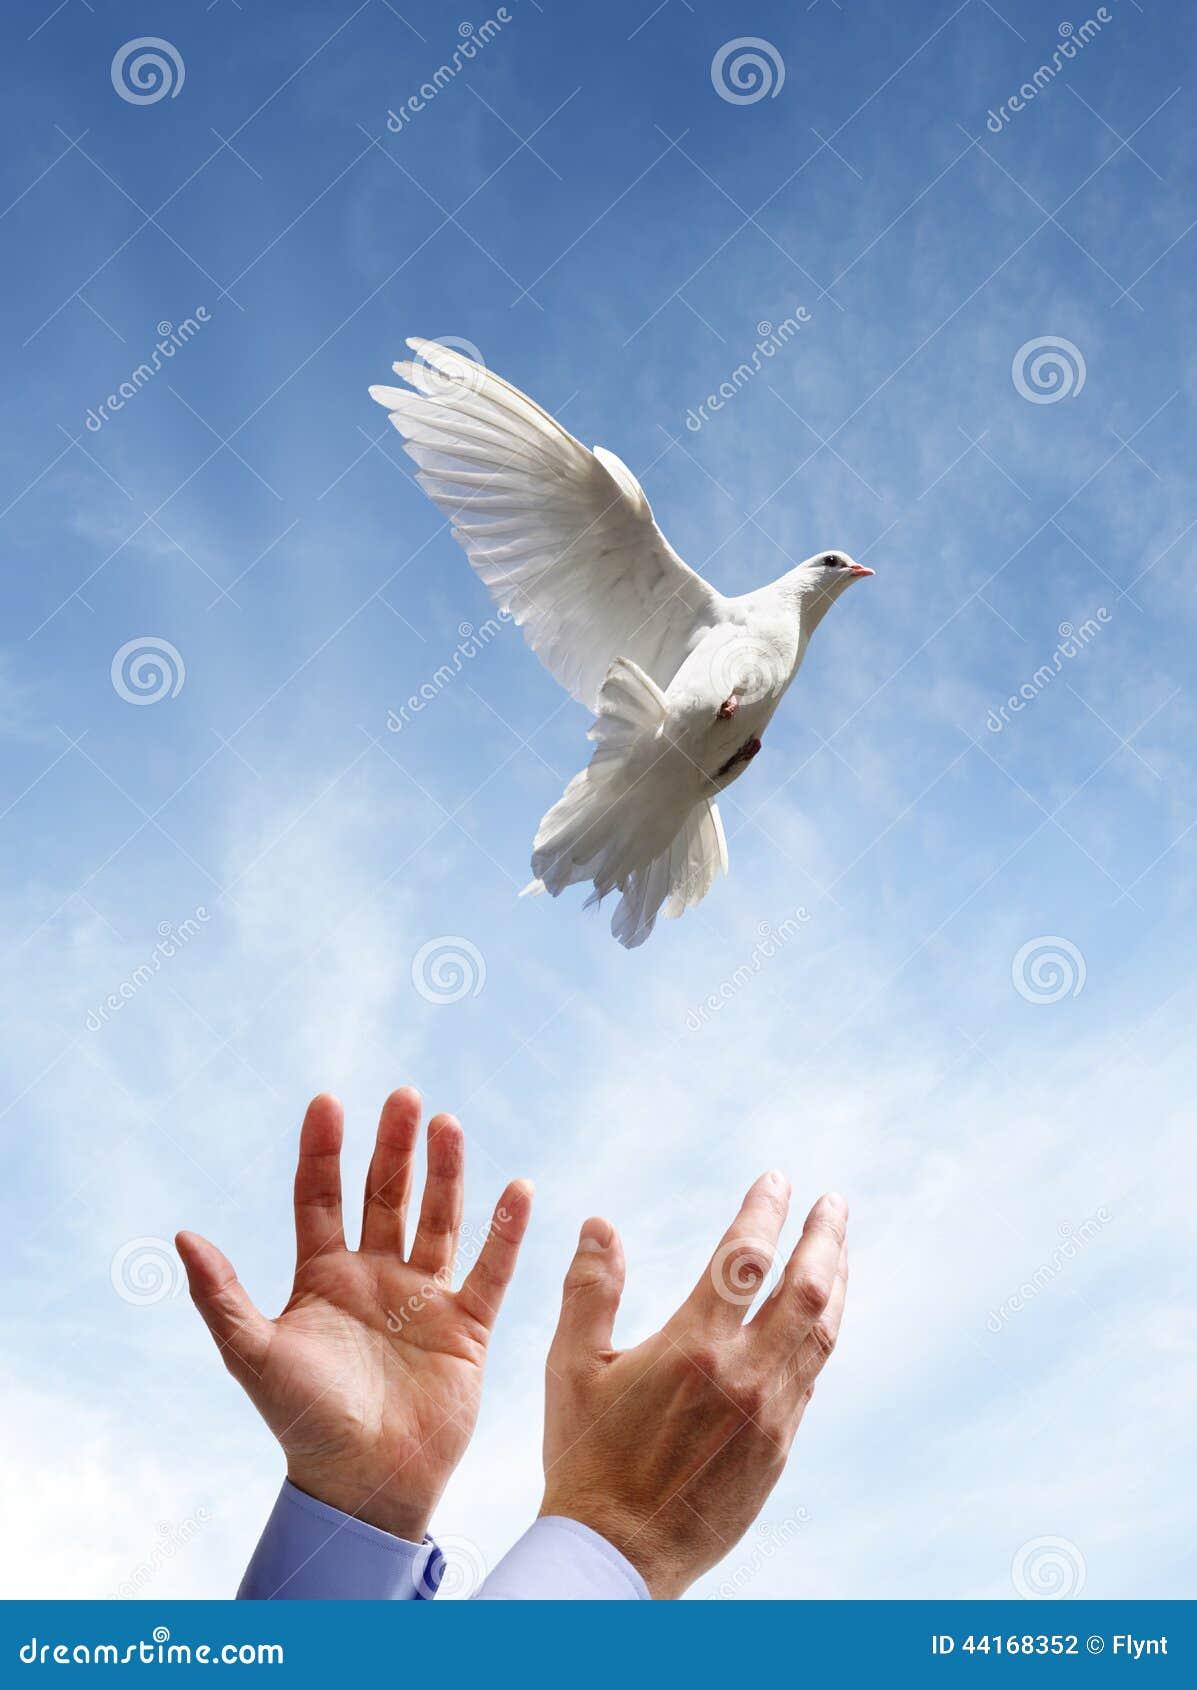 Freedom, peace and spirituality.